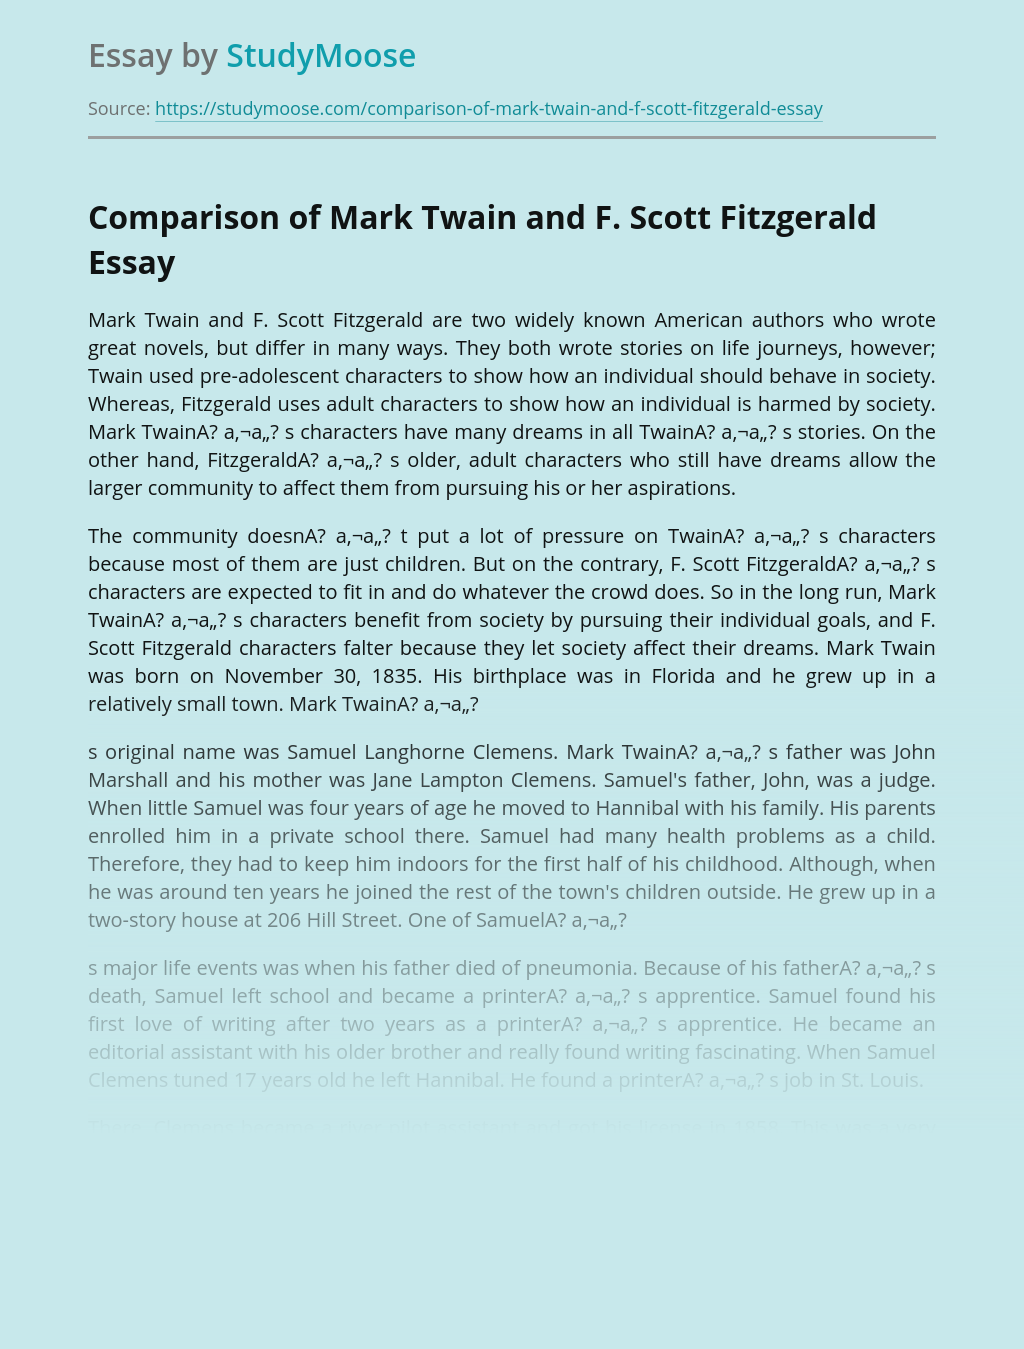 Comparison of Mark Twain and F. Scott Fitzgerald